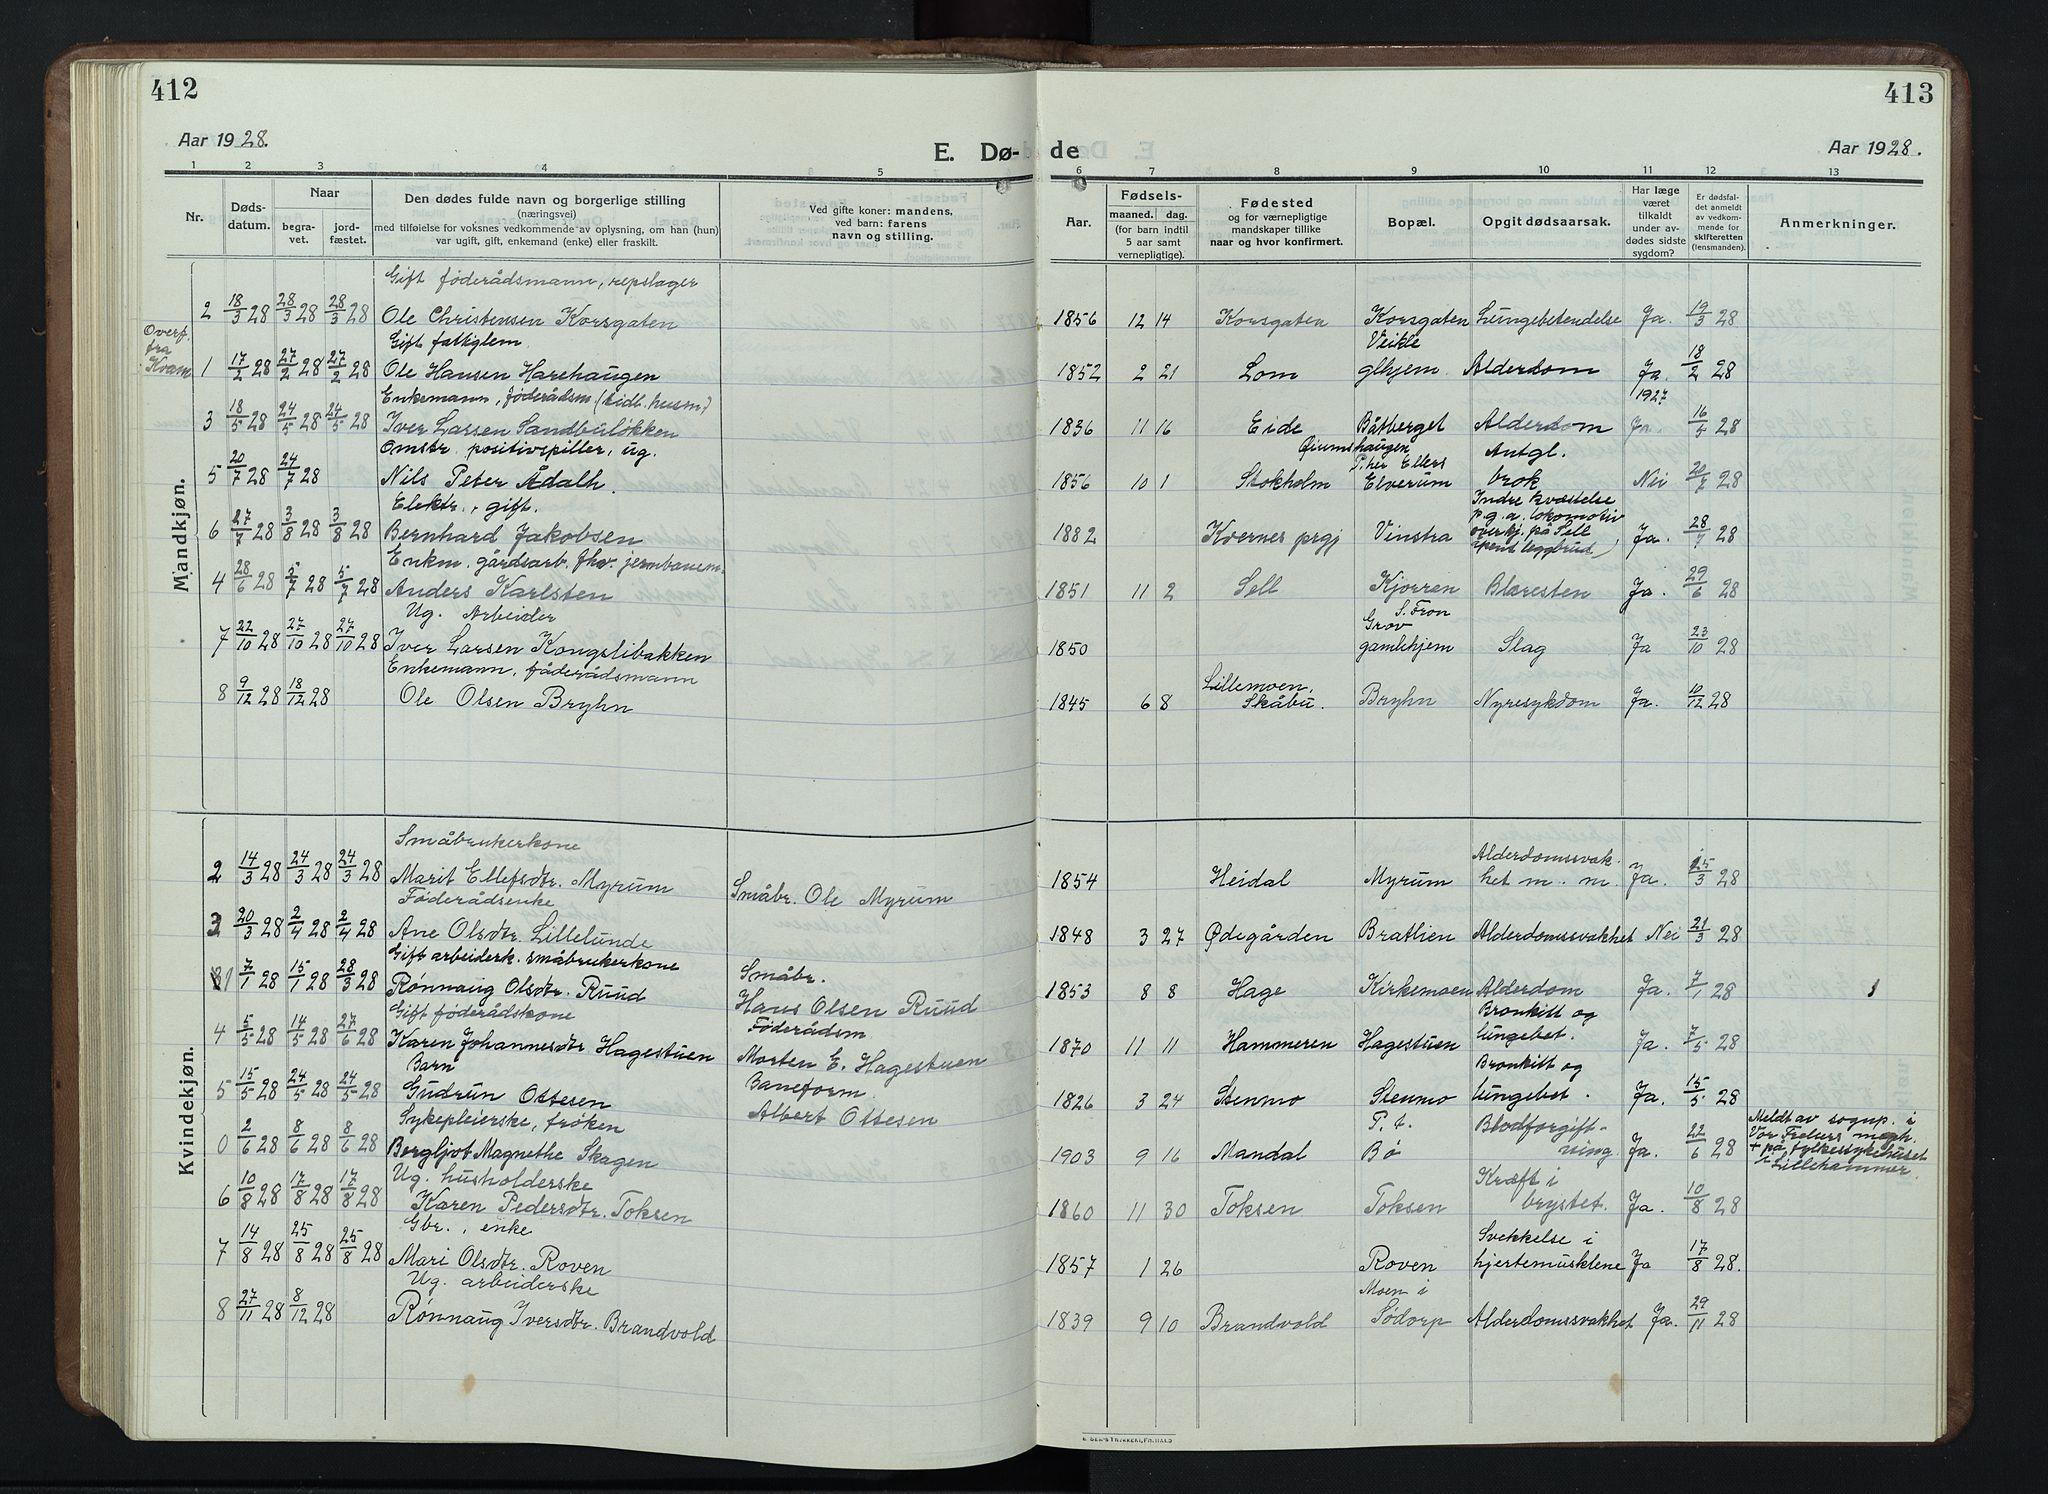 SAH, Nord-Fron prestekontor, Klokkerbok nr. 7, 1915-1946, s. 412-413